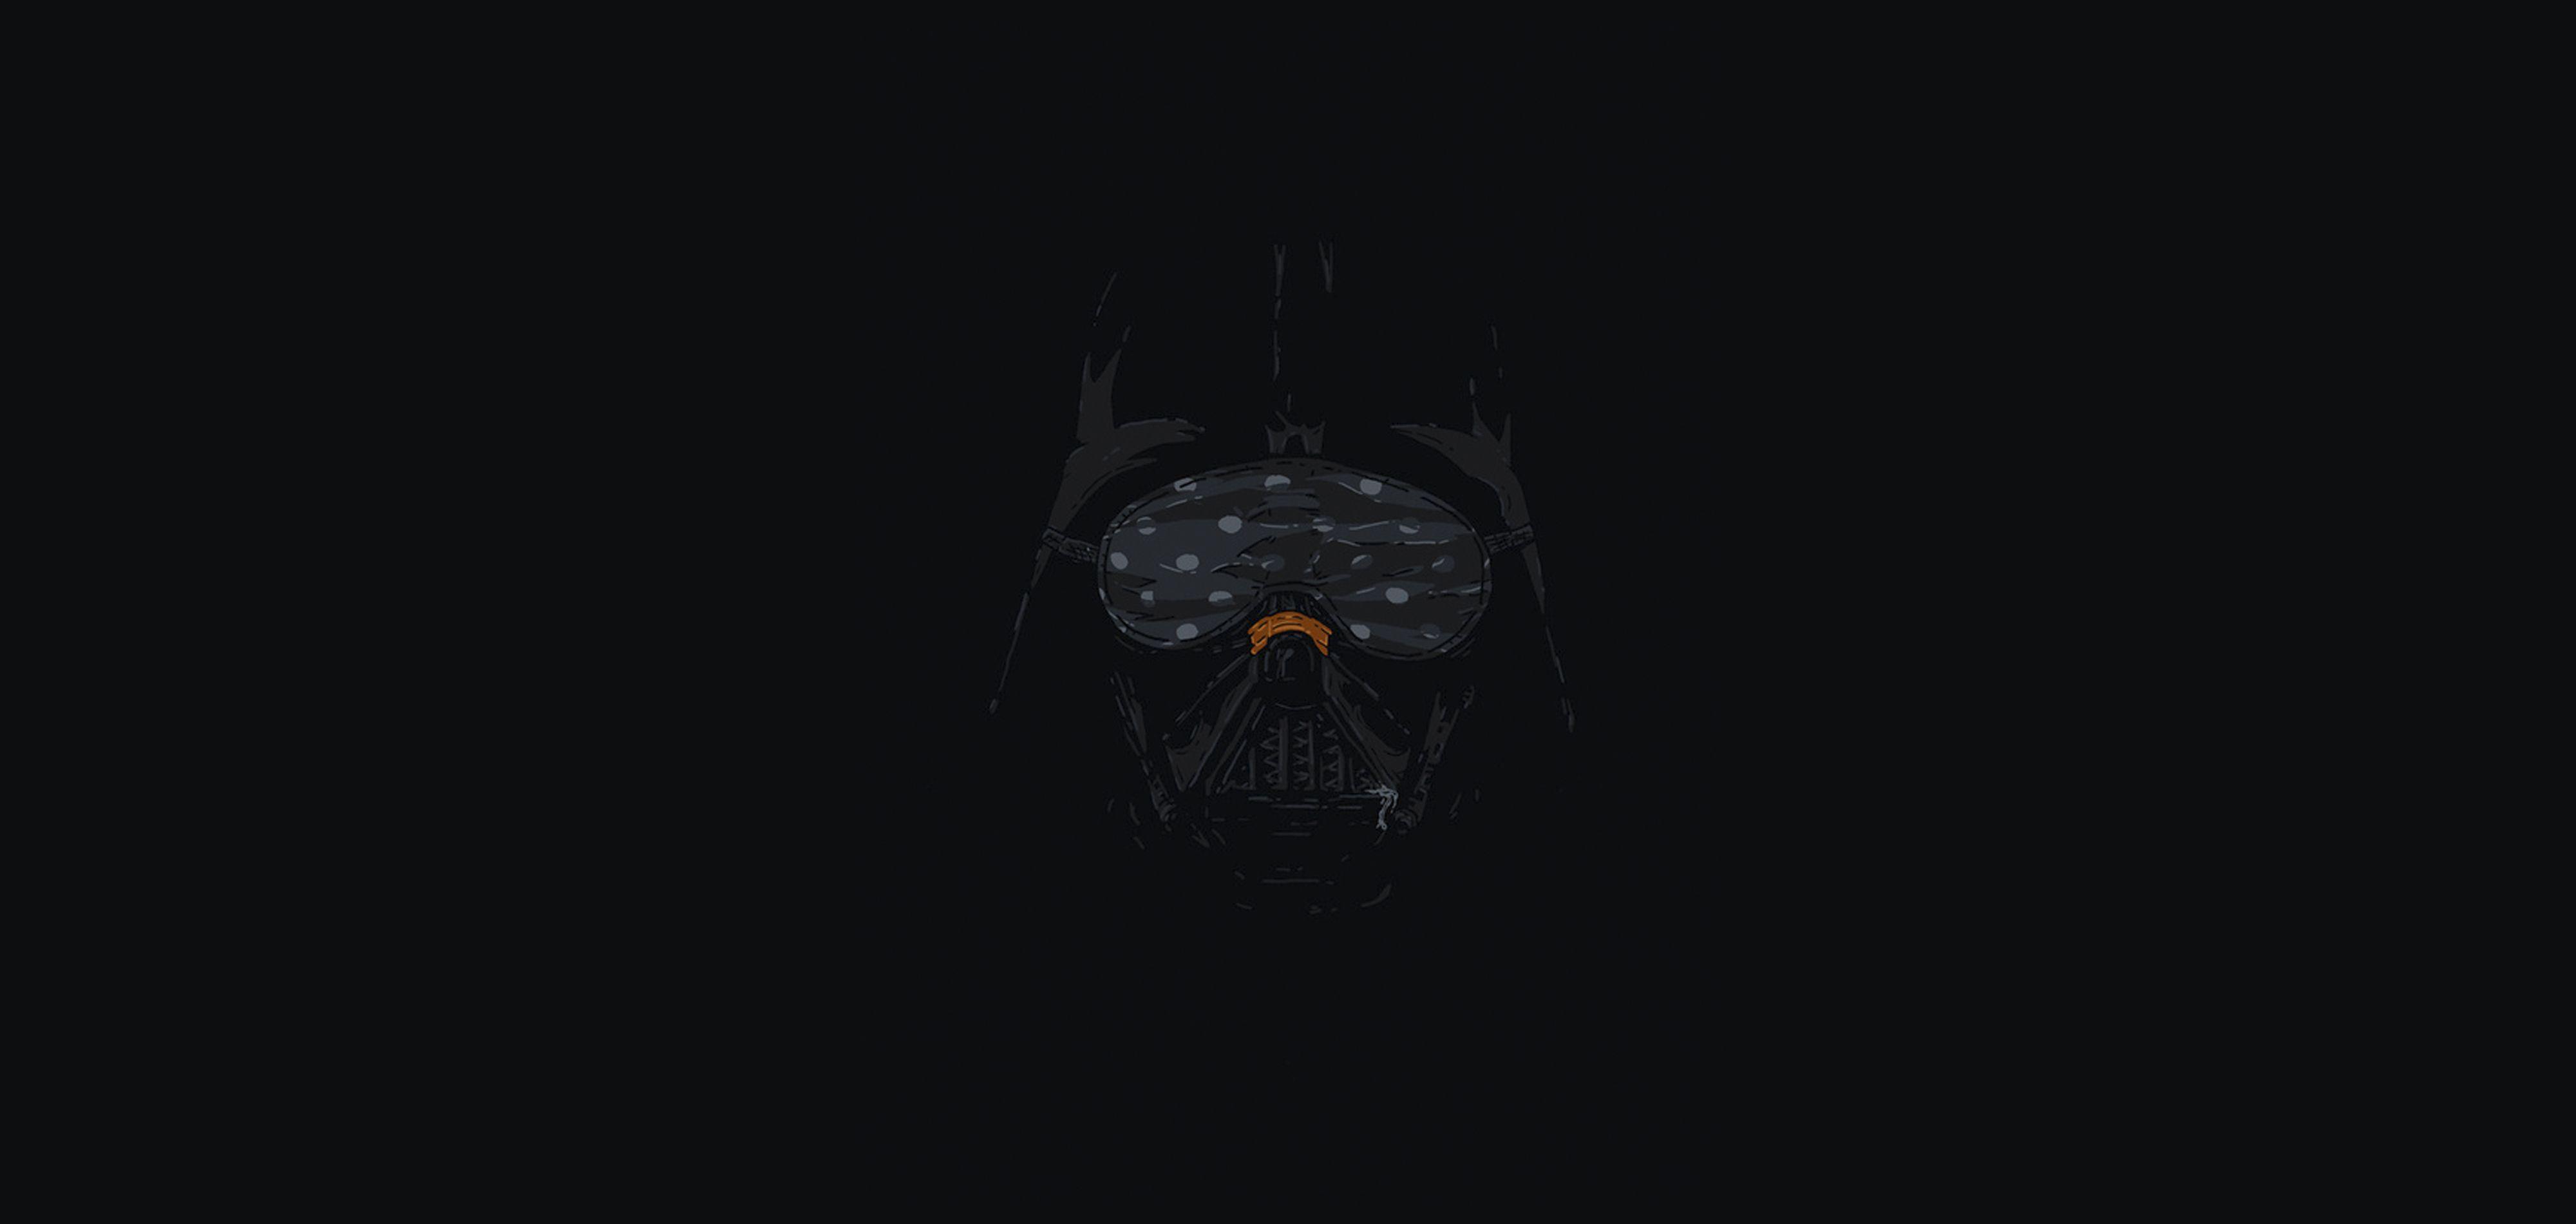 Minimal Star Wars Wallpapers Top Free Minimal Star Wars Backgrounds Wallpaperaccess